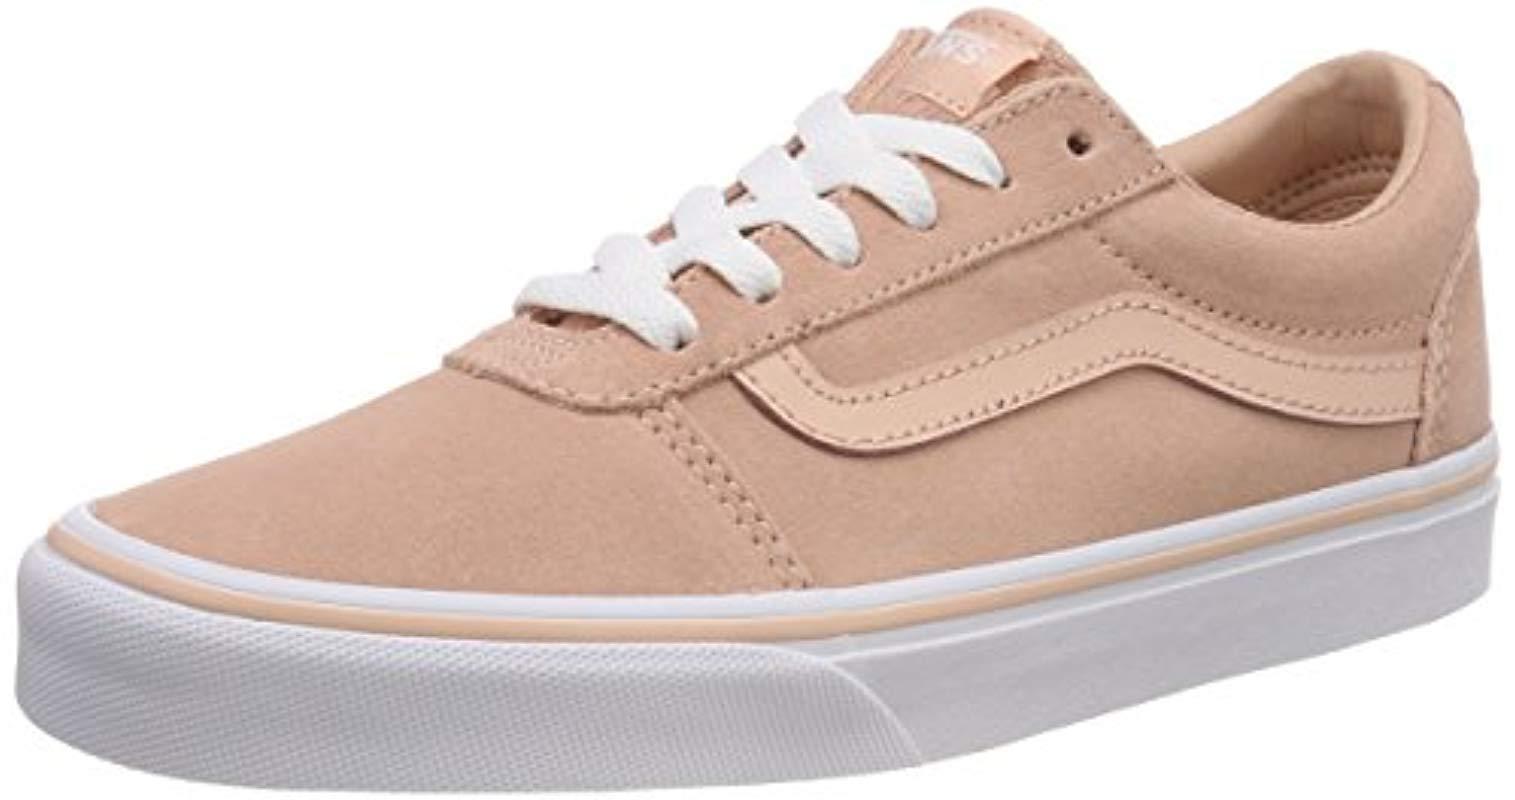 Vans  s Ward Suede Low-top Sneakers in Pink - Lyst 830c14e6a